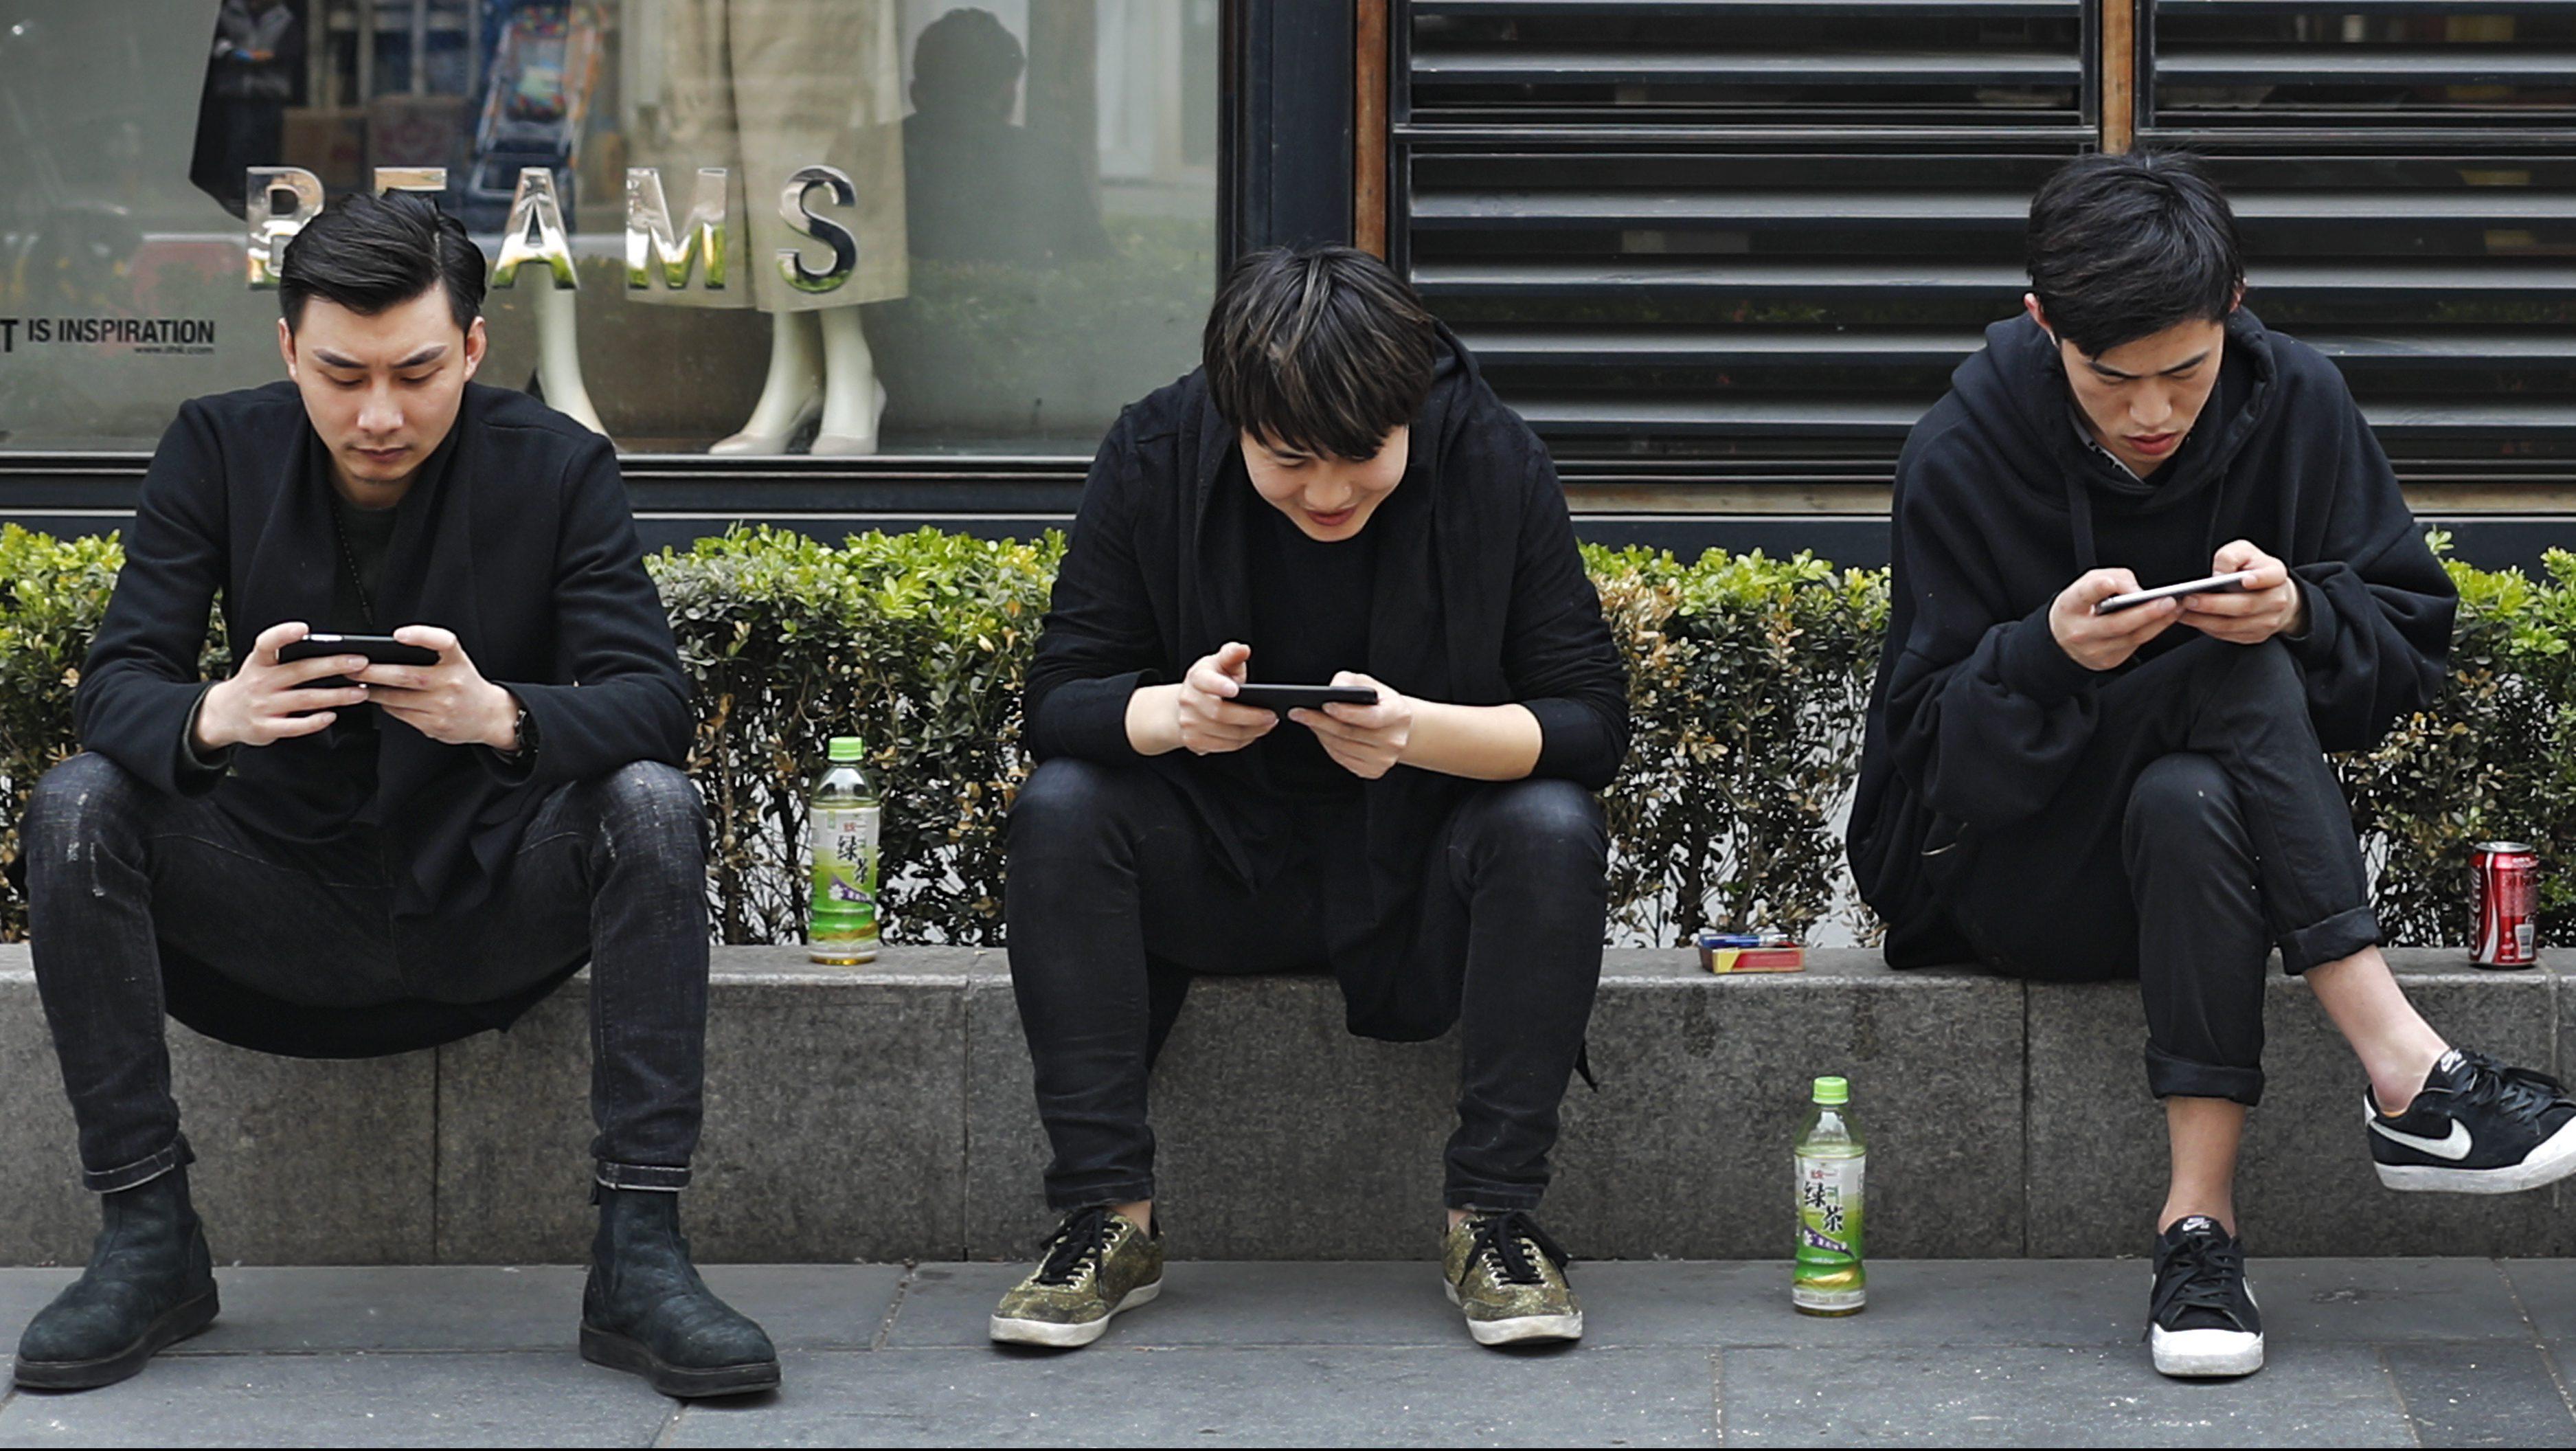 Three men use their smartphones